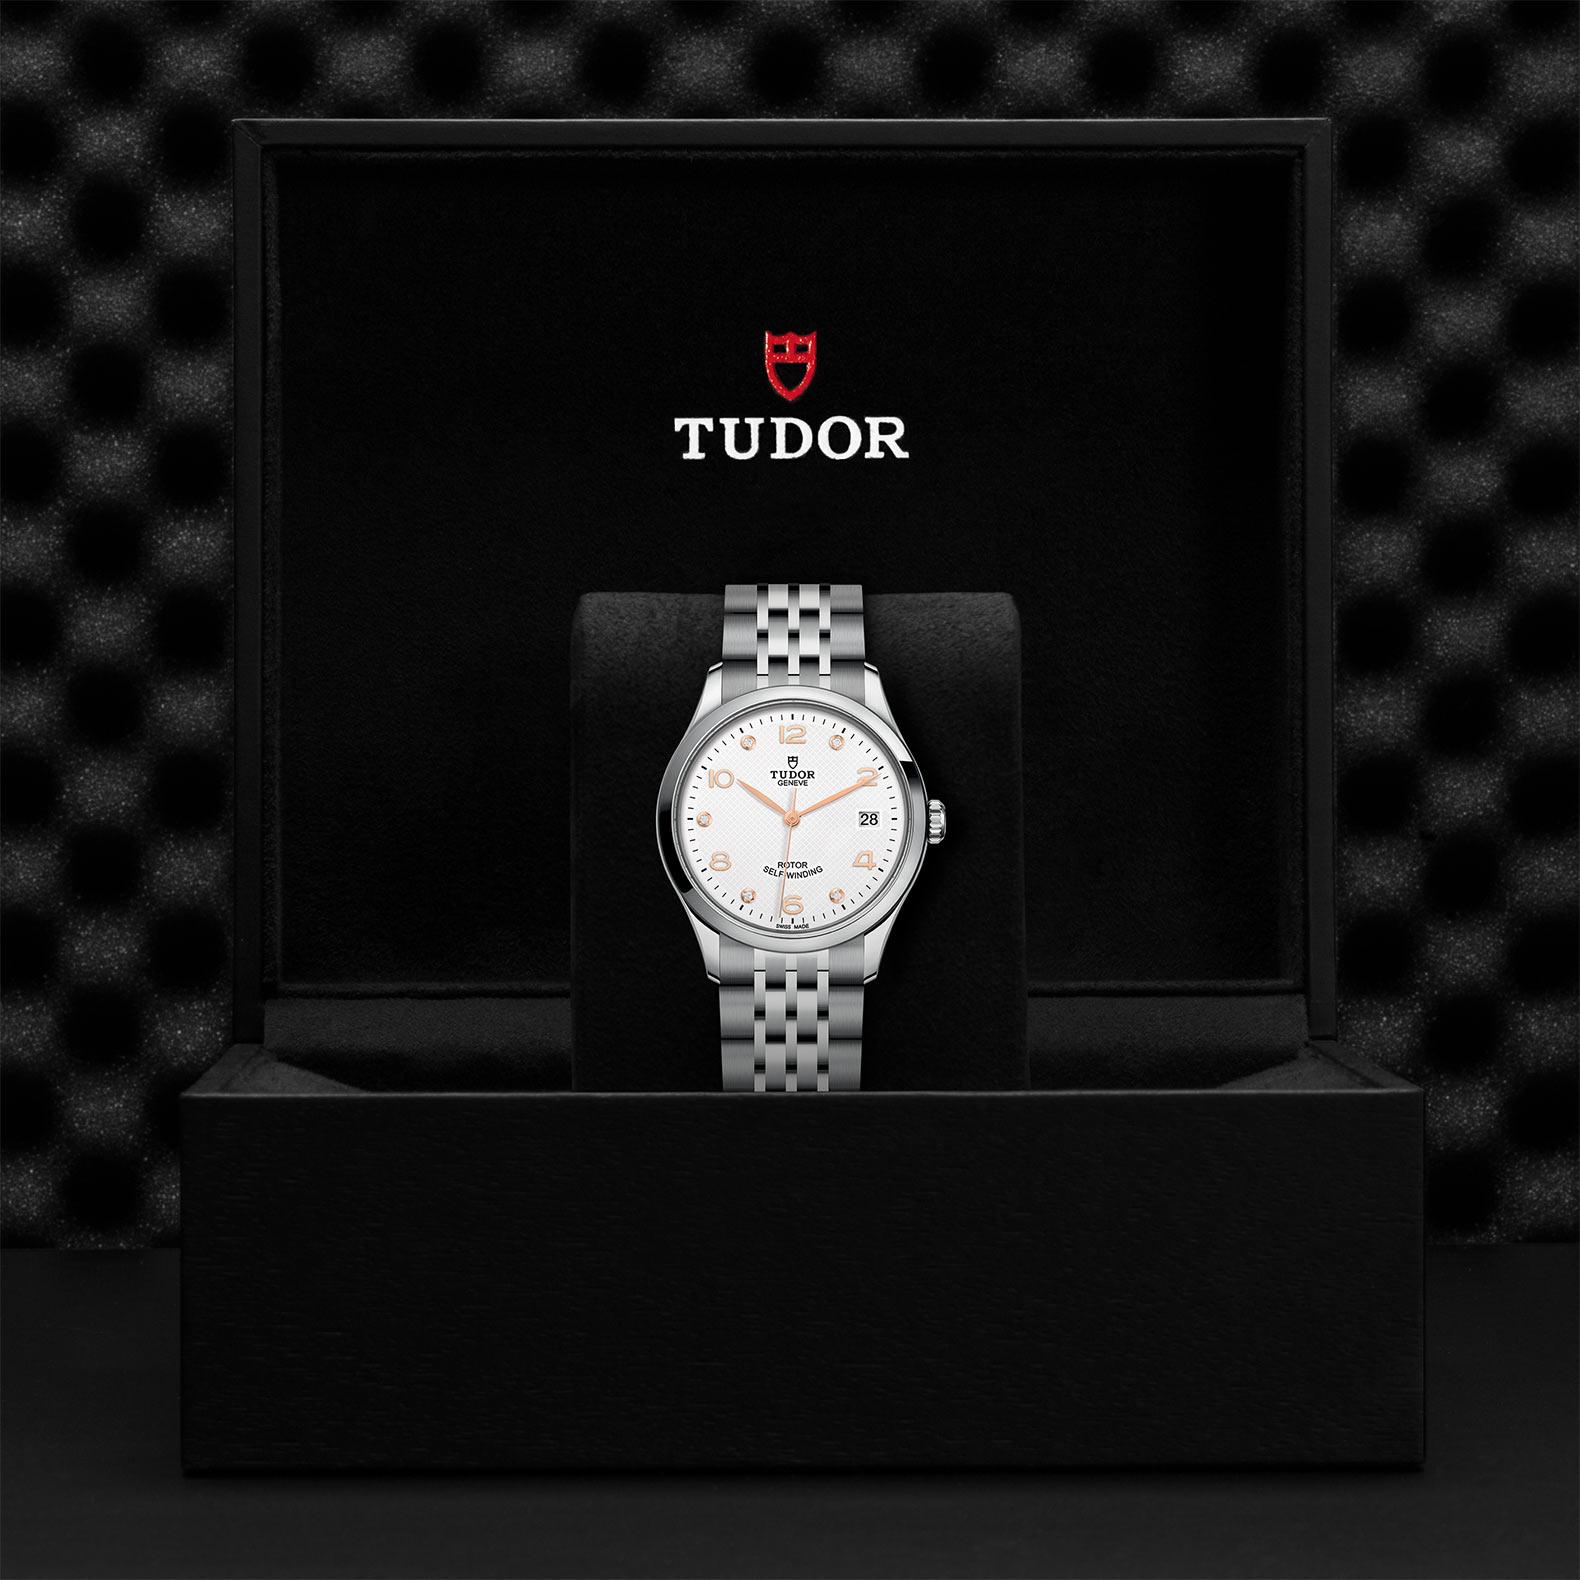 TUDOR 1926 - M91450-0013